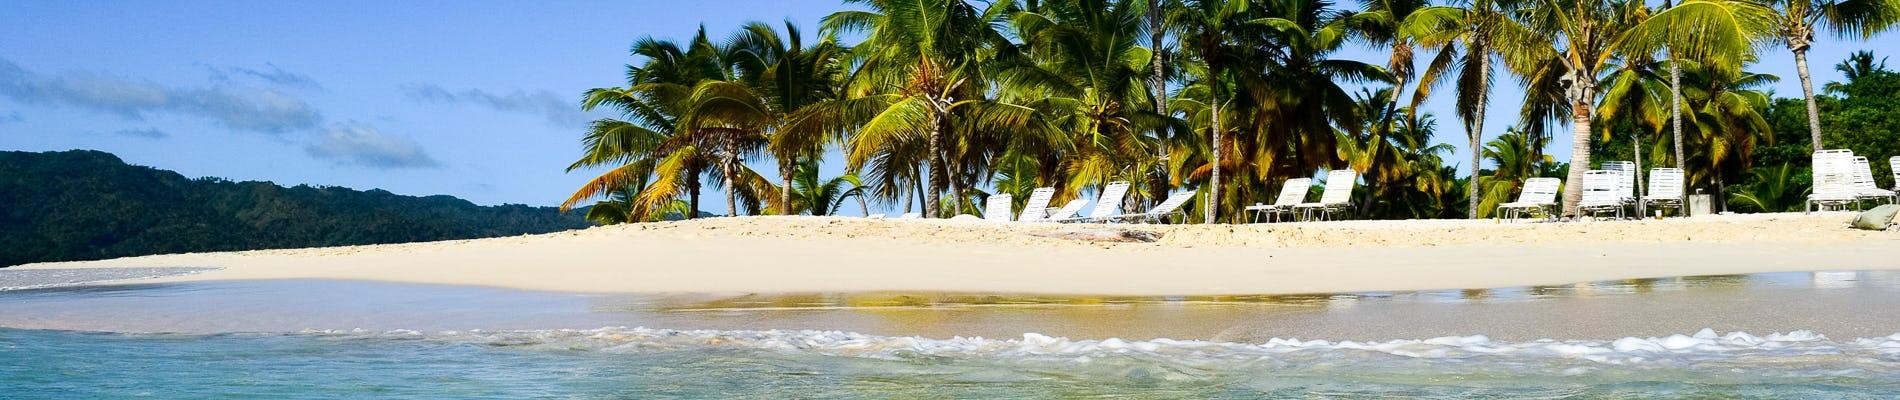 Bacardi Insel Dom Rep Karte.Cayo Levantado Dominikanische Republik Bilder Videos Insidertipps